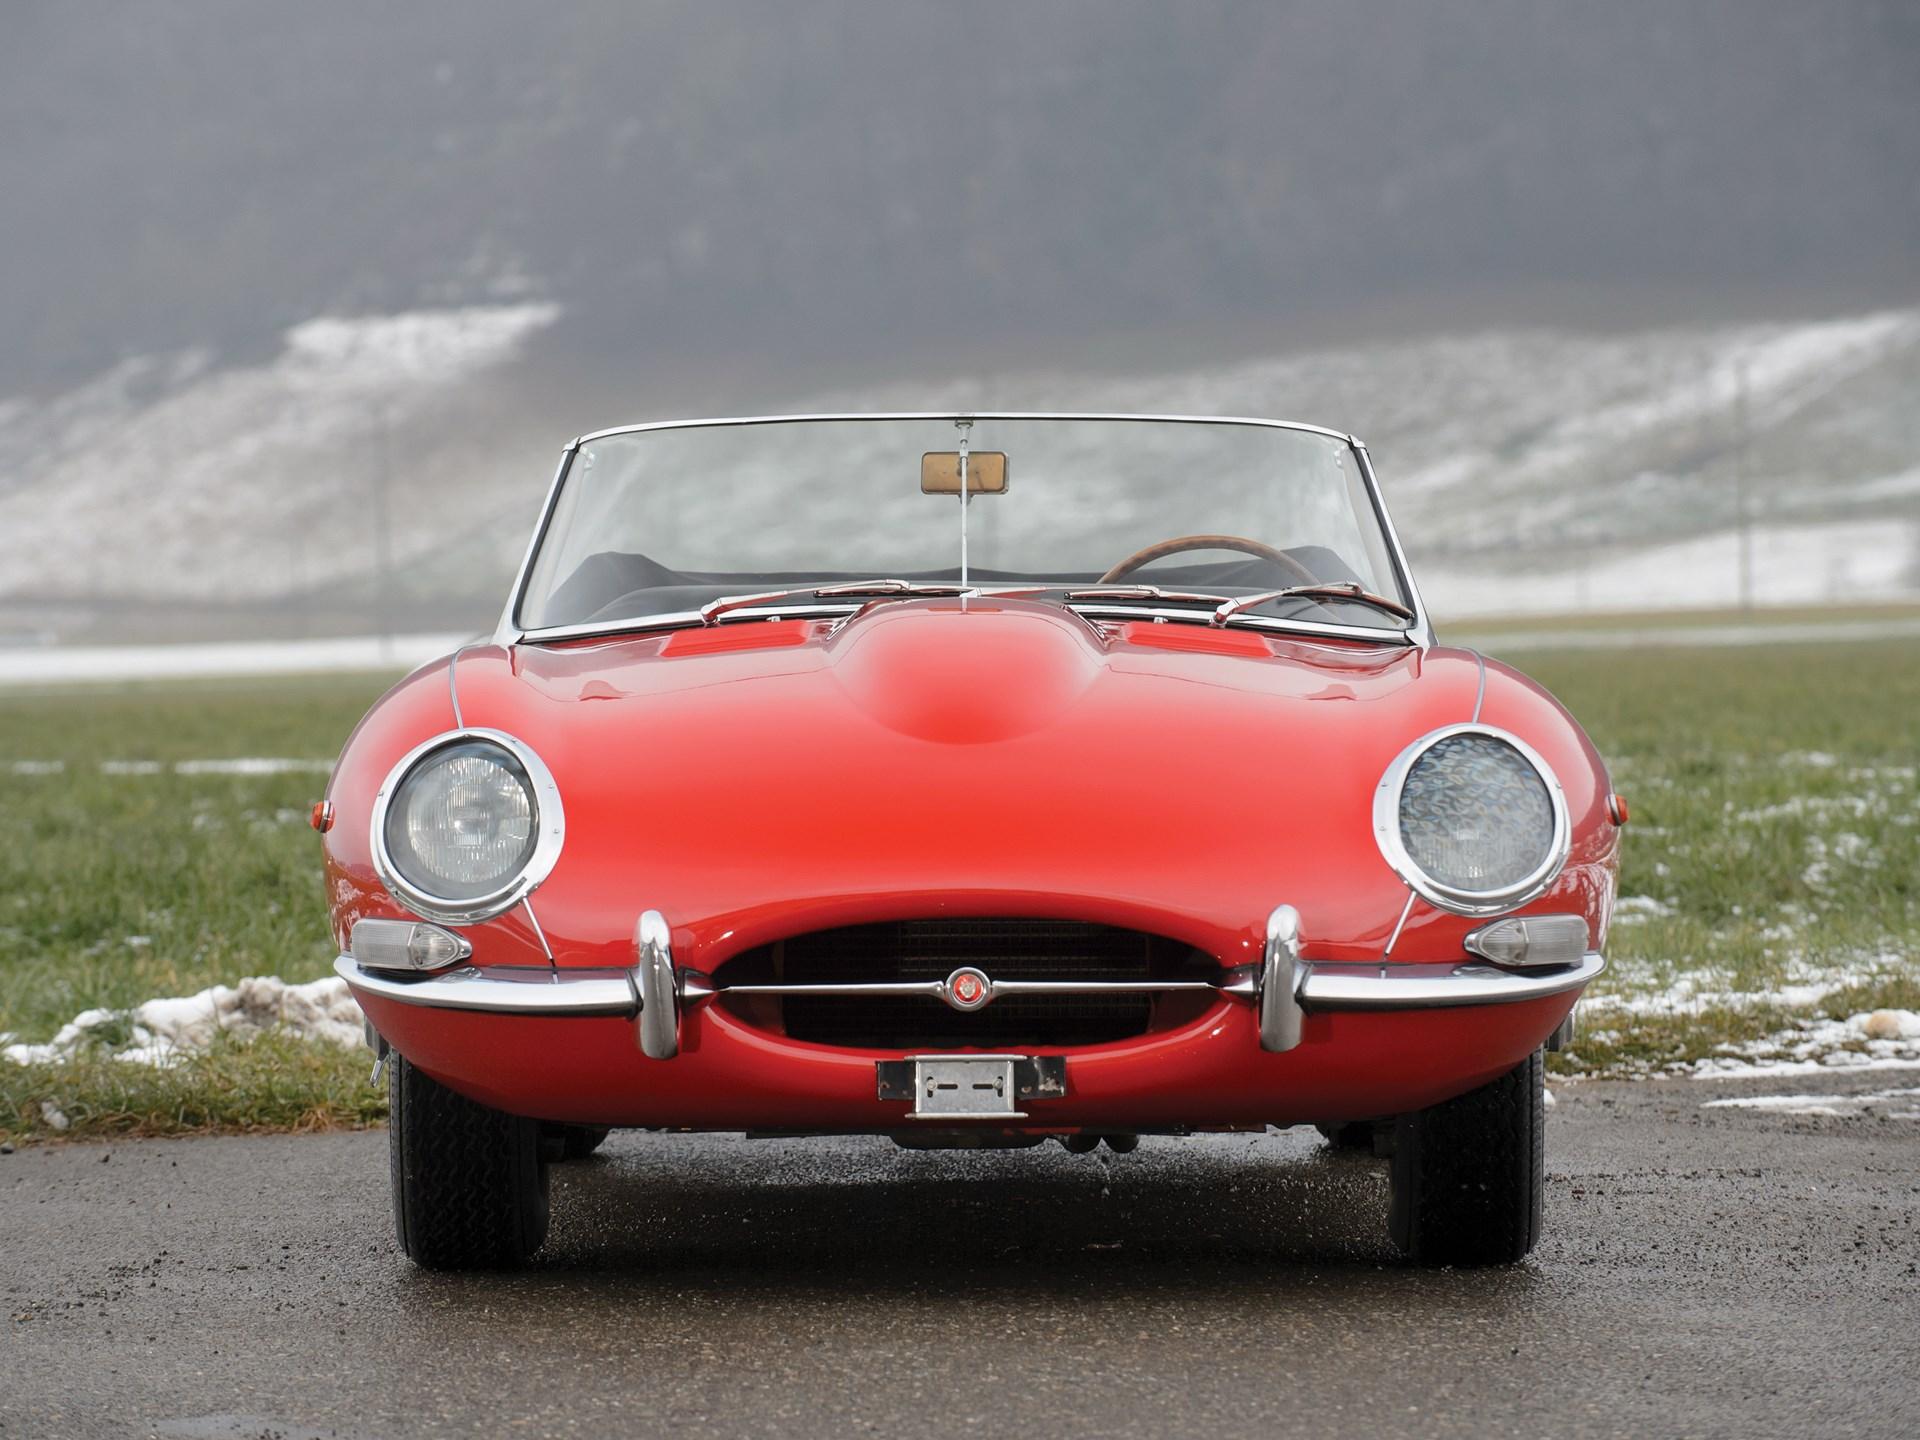 1962 Jaguar E-Type Series 1 3.8-Litre Roadster